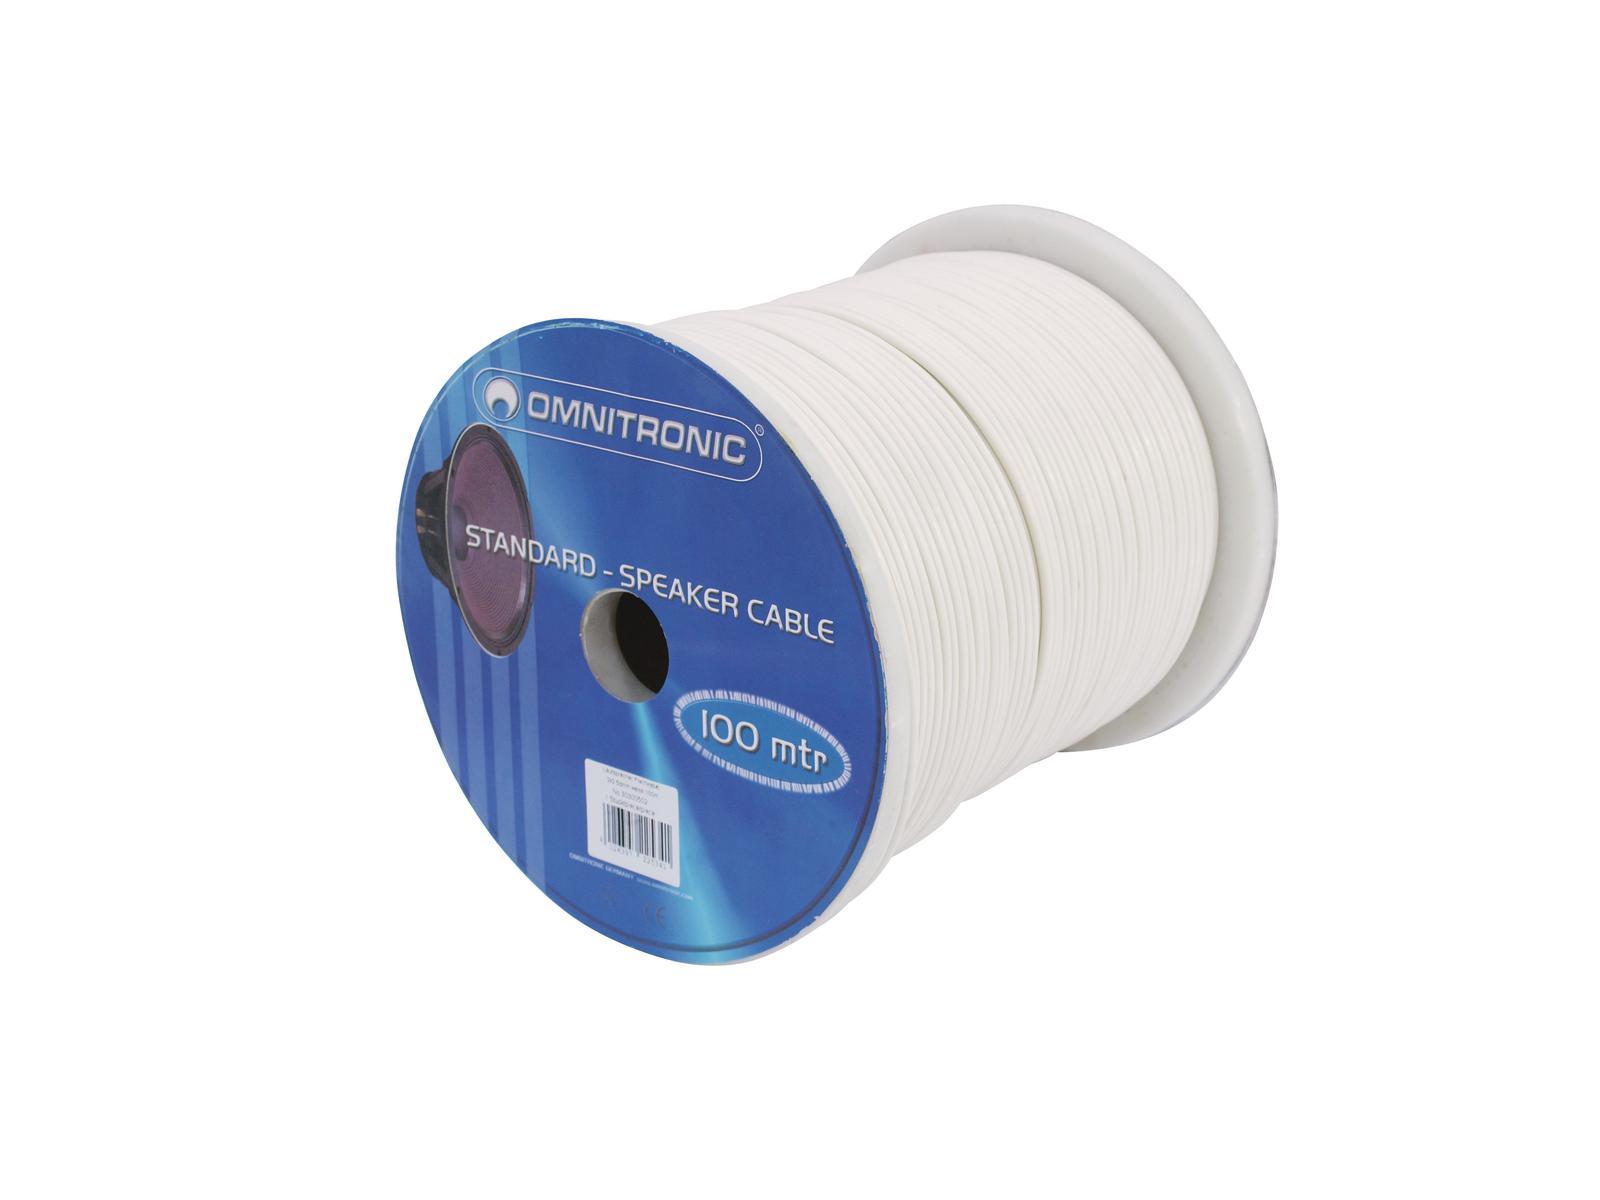 Cable Coil Coil Cable Bulk 2x1.5 100m OMNITRONIC White